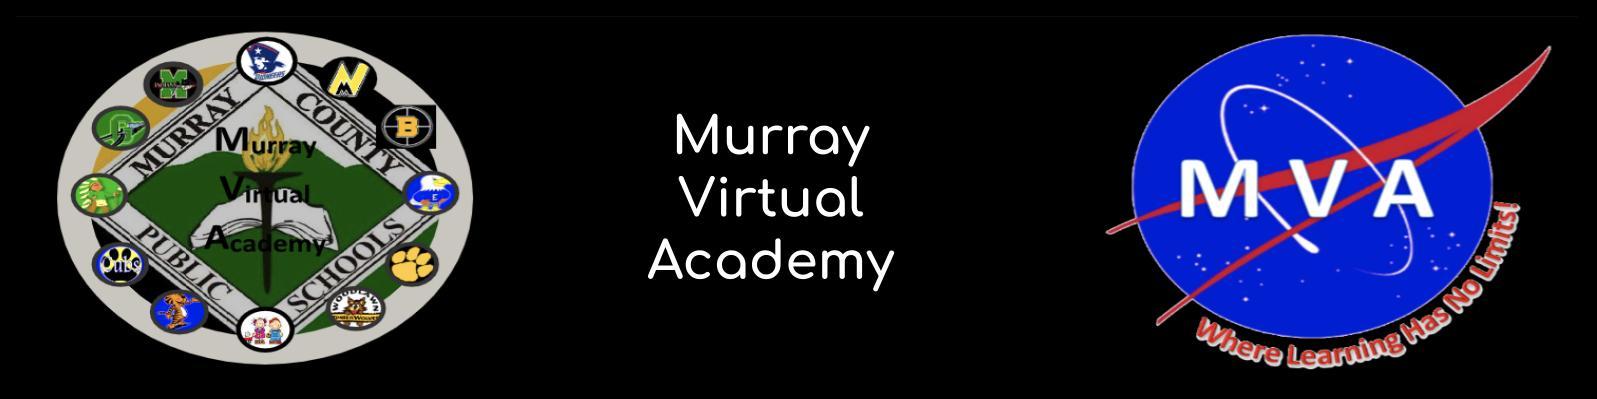 Murray Virtual Academy